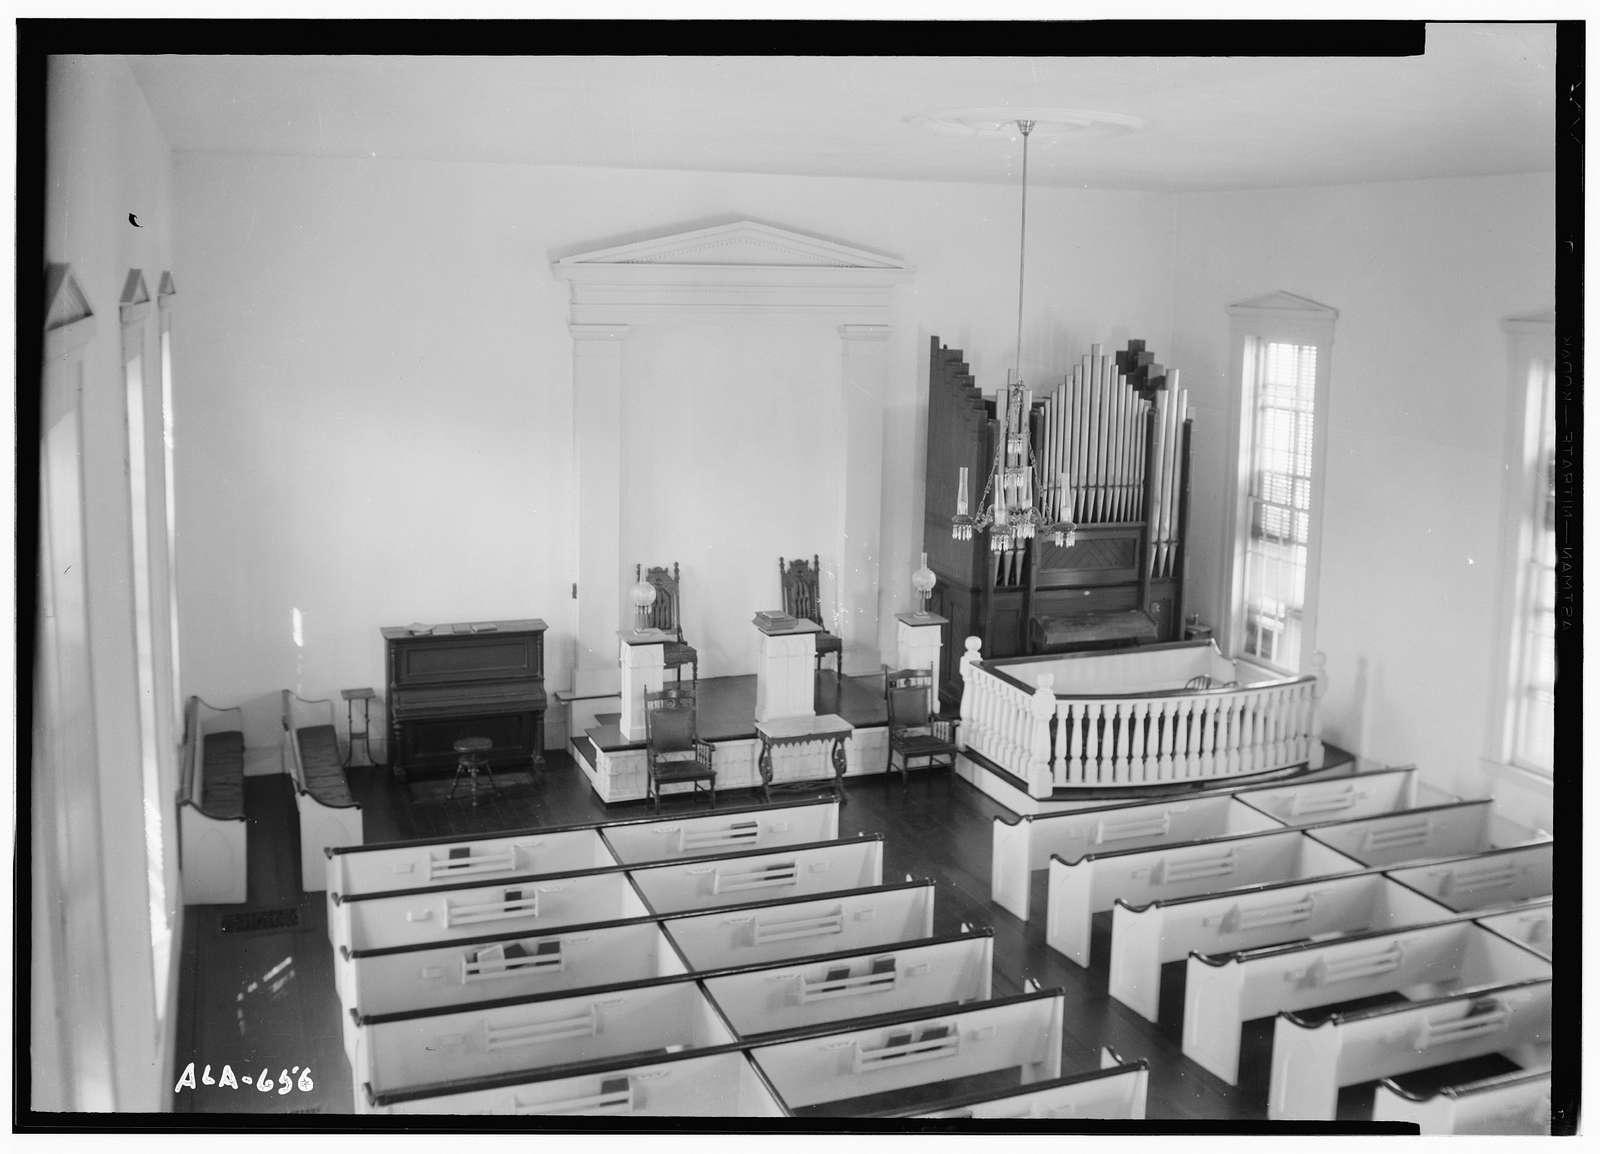 Wetumpka Presbyterian Church, West Bridge & North Bridge Streets, Wetumpka, Elmore County, AL